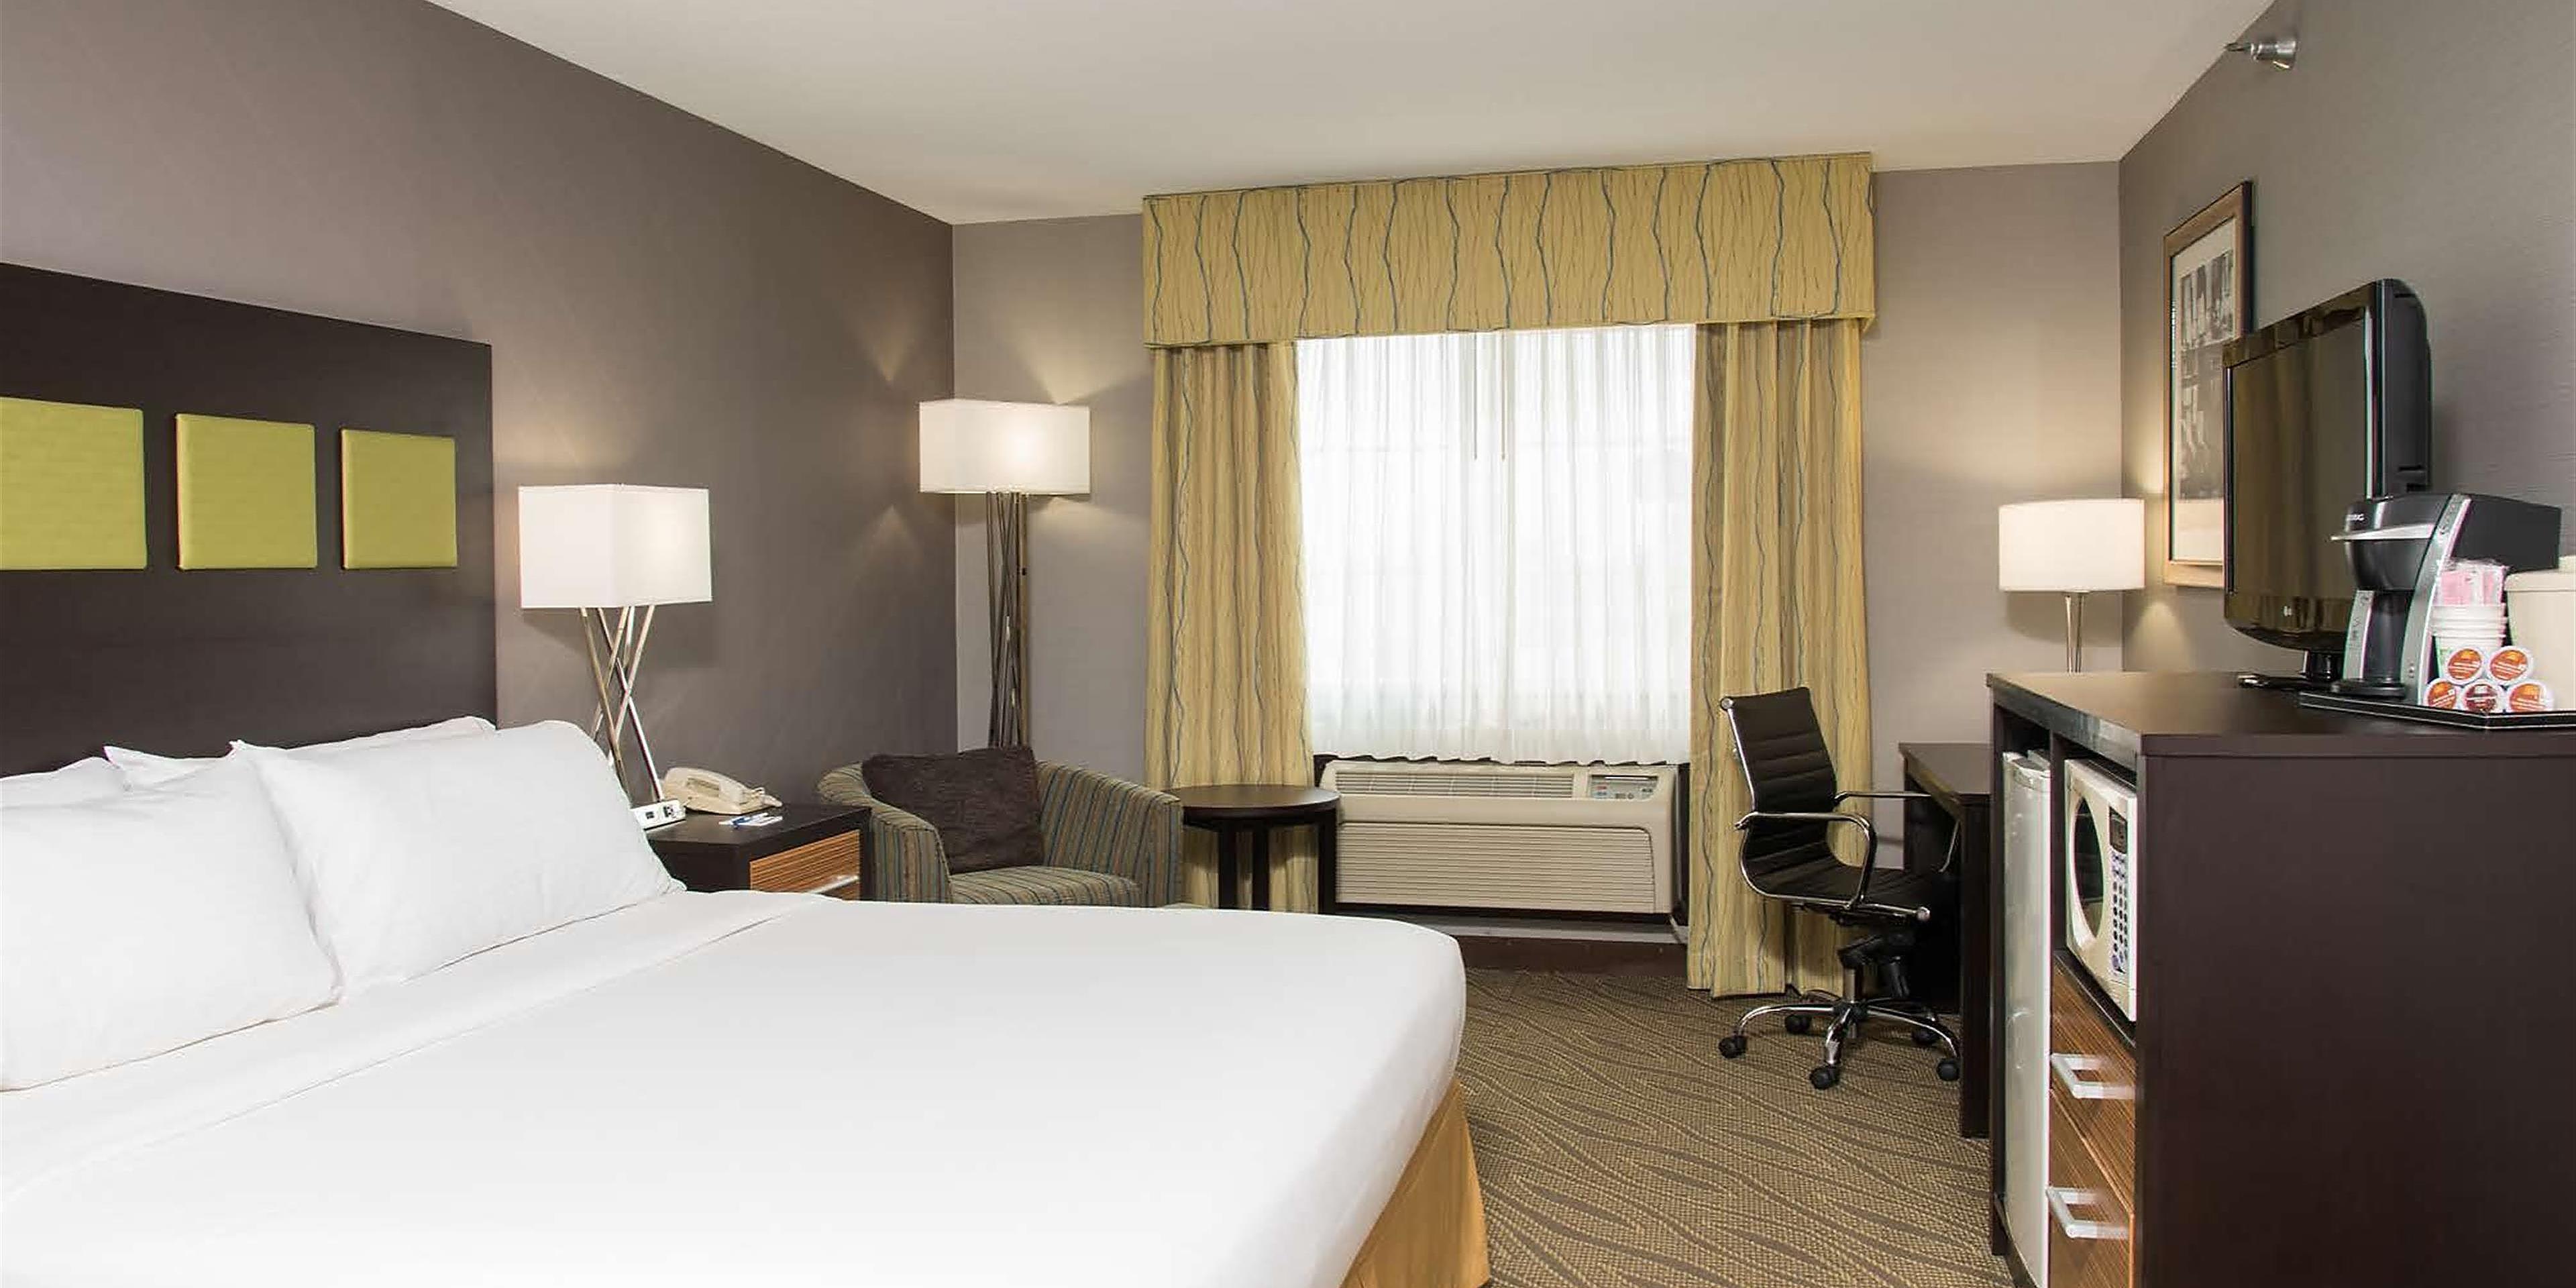 Holiday Inn Express Suites Danville Ihg Hotel